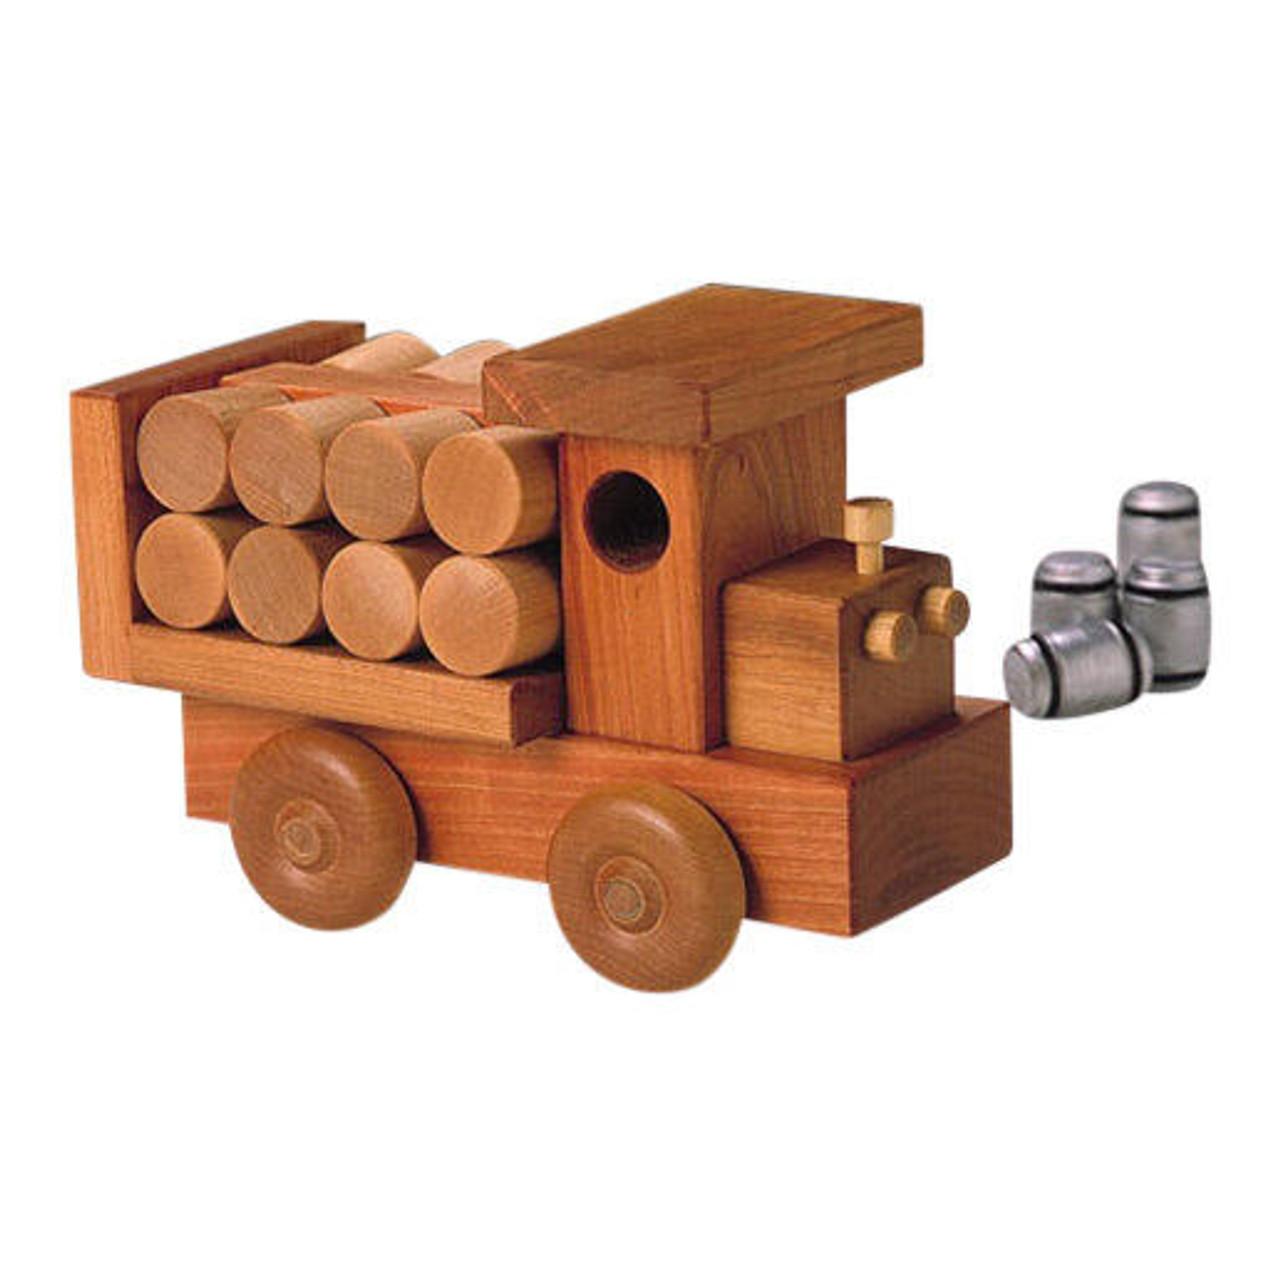 Cherry Tree Toys Barrel Truck Parts Kit